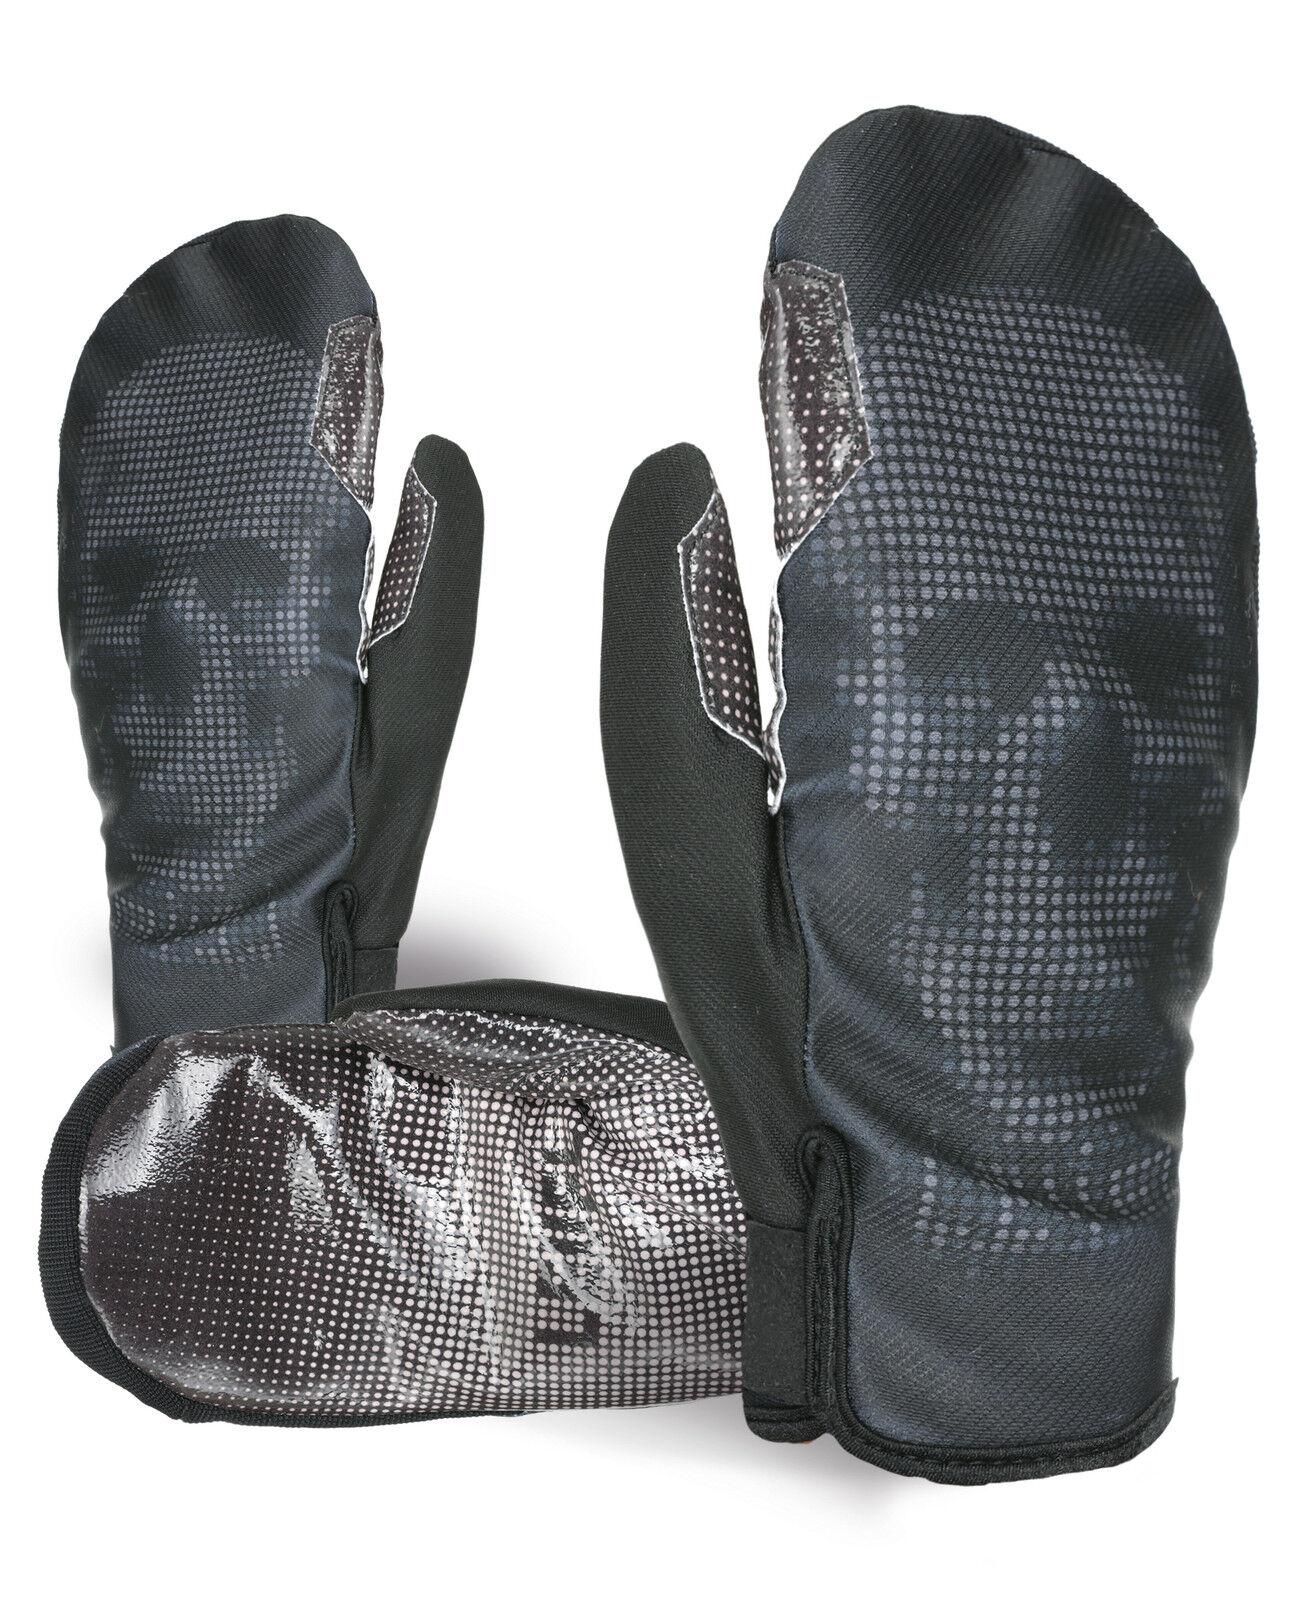 Level Handschuh Skihandschuh black Pro Rider Mitt WS Windstopper